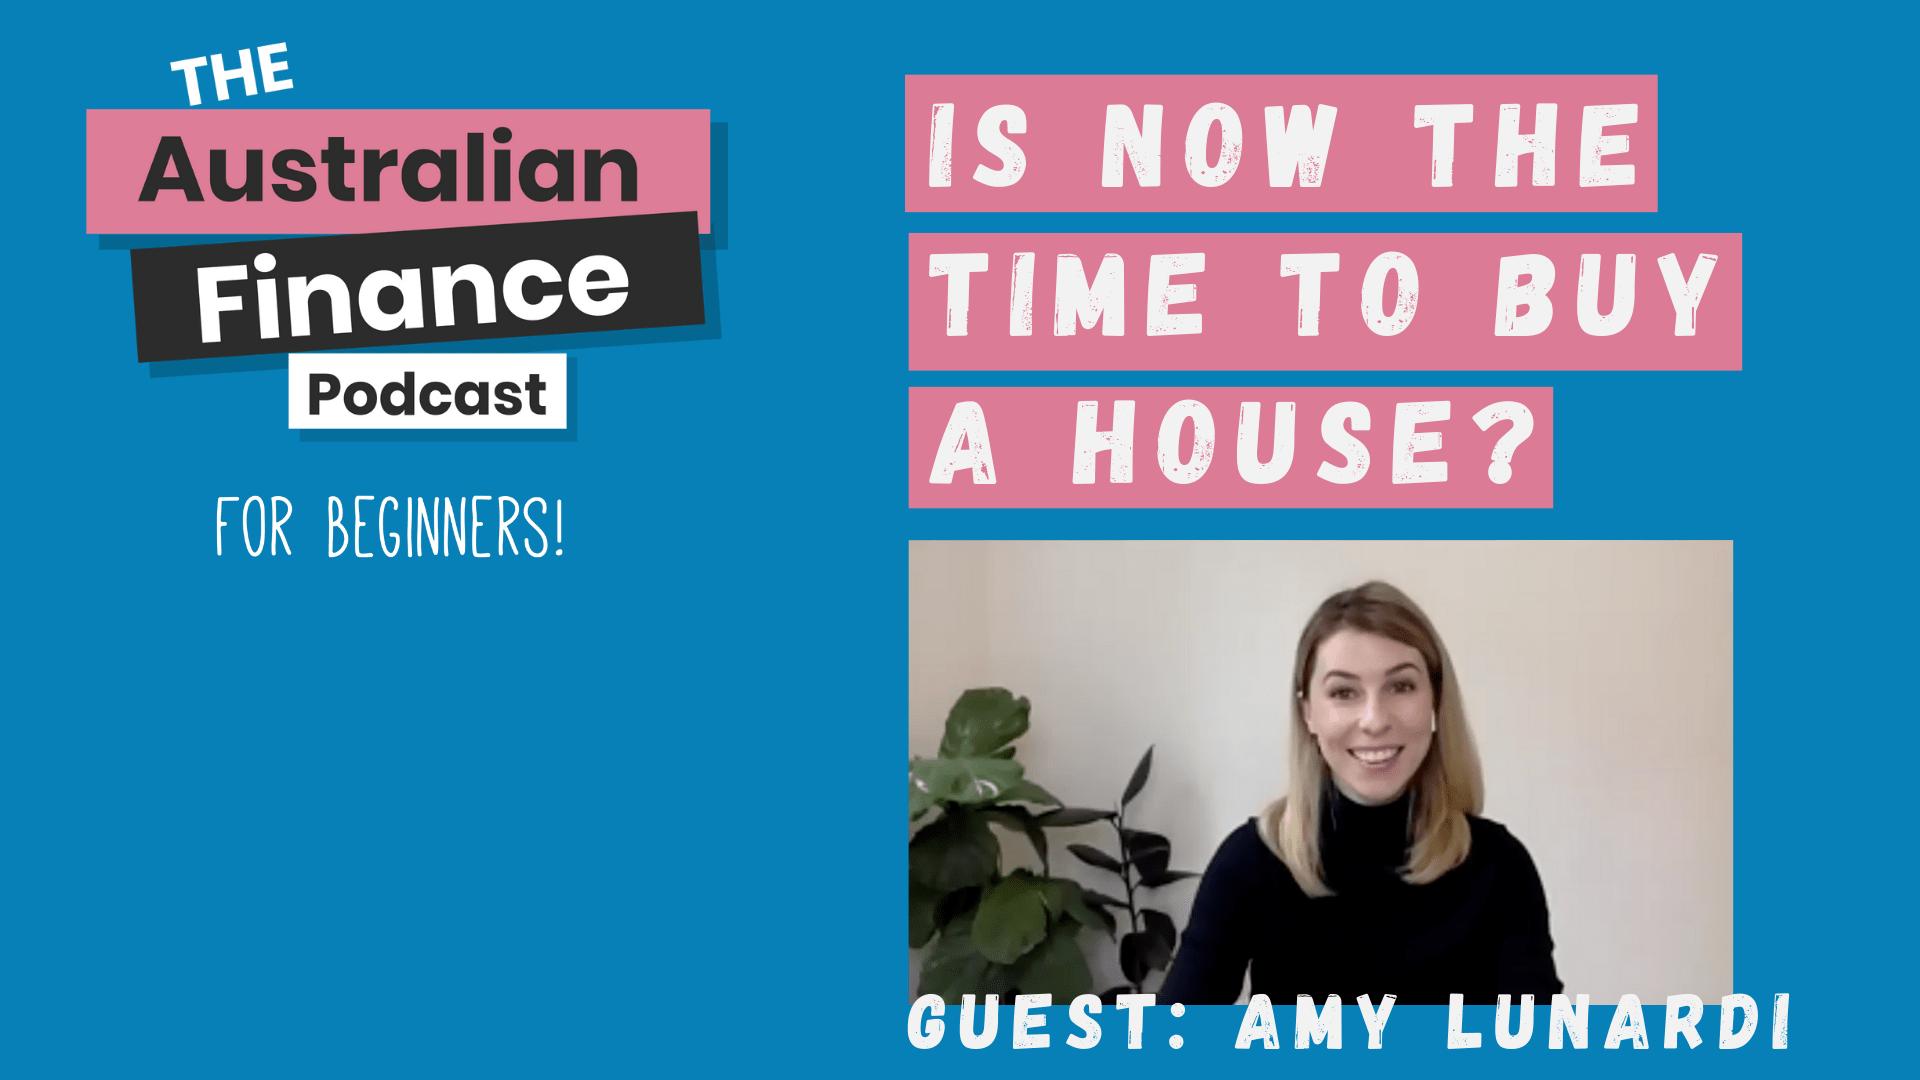 Amy Lunardi - The Australian Finance Podcast